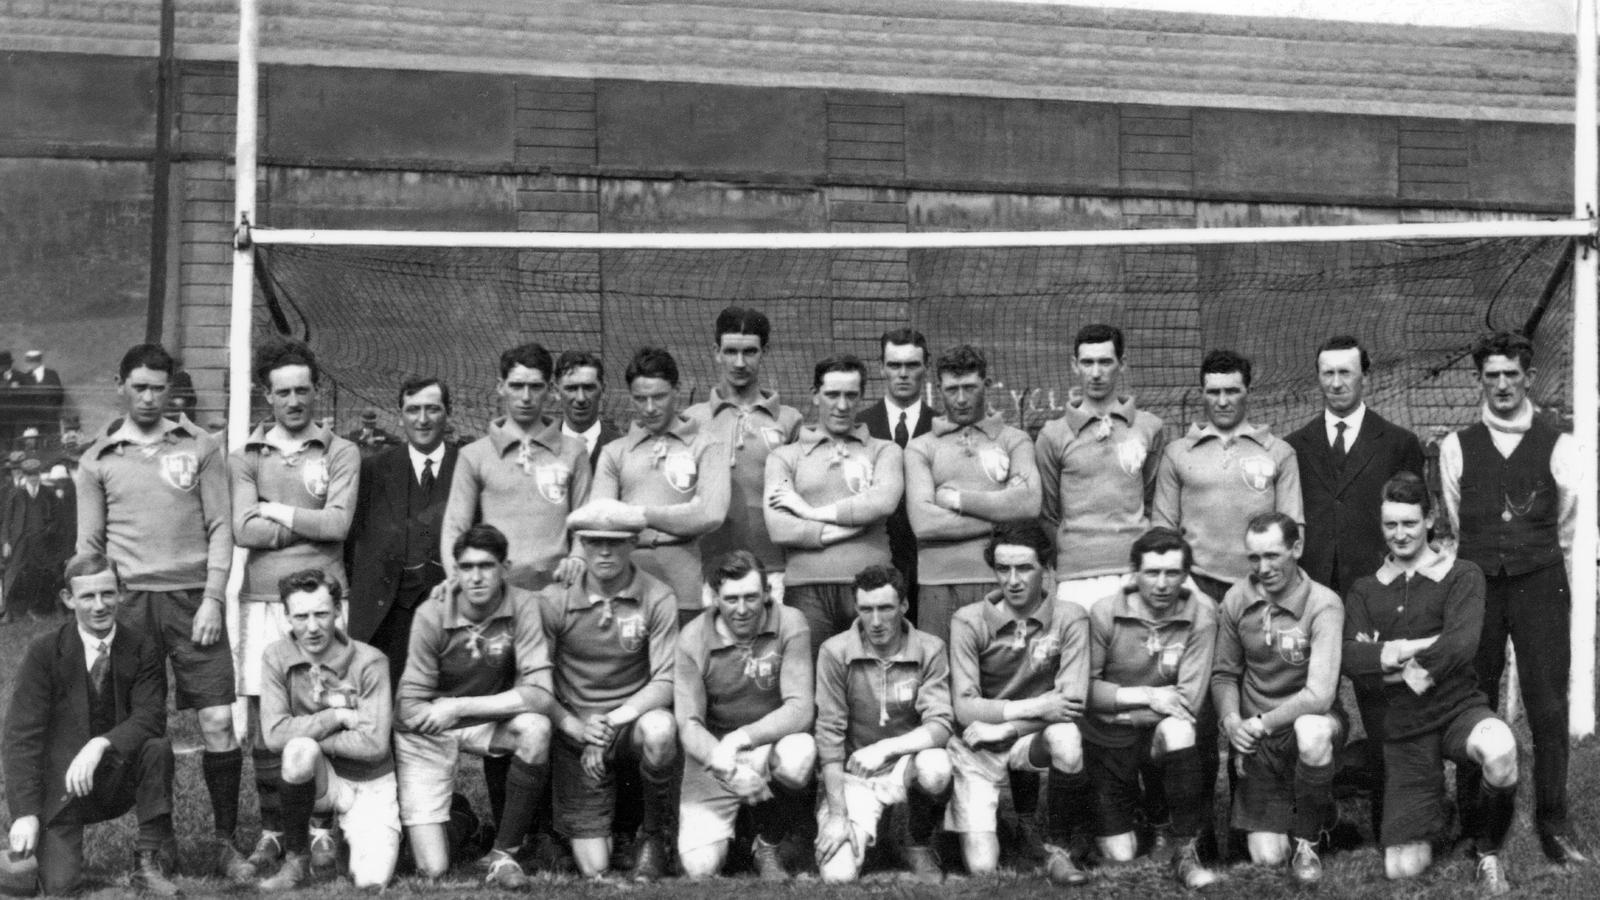 Image - Dublin team, Croke Park, 21 November 1920 (Credit: GAA Museum, Croke Park)